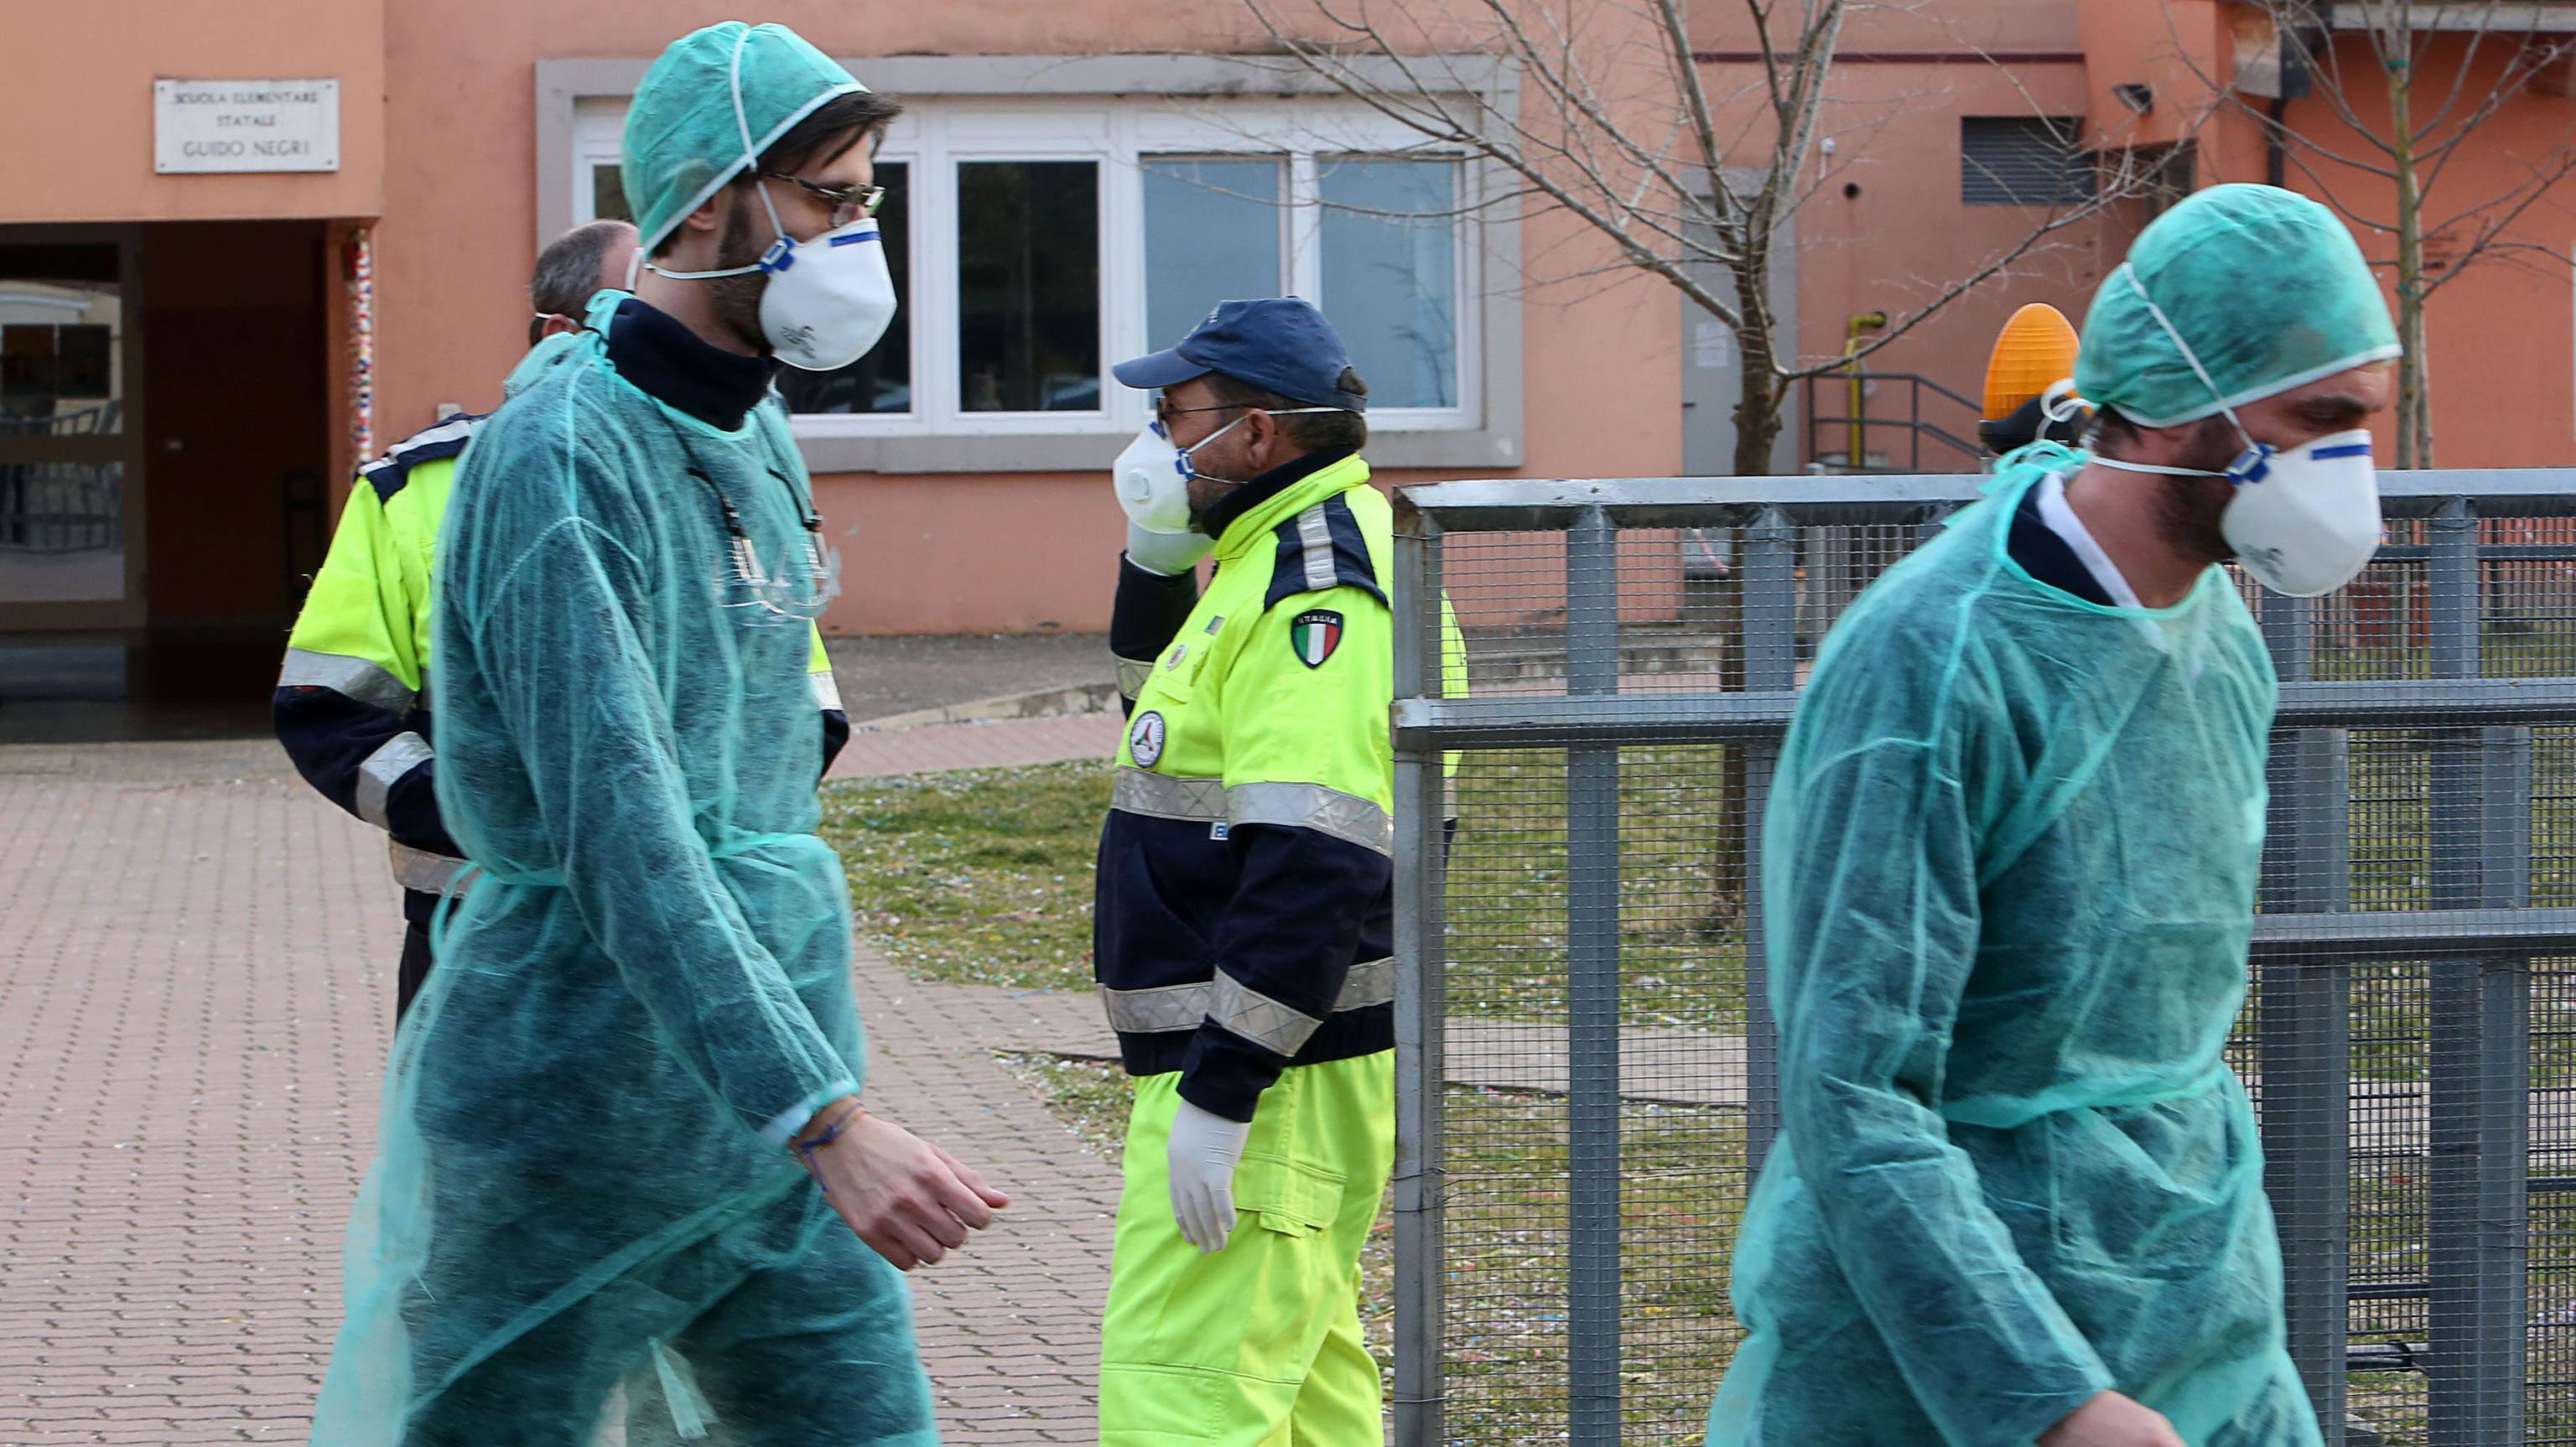 Coronavirus: Autoridades italianas confirman la tercera muerte en el país producto de la epidemia